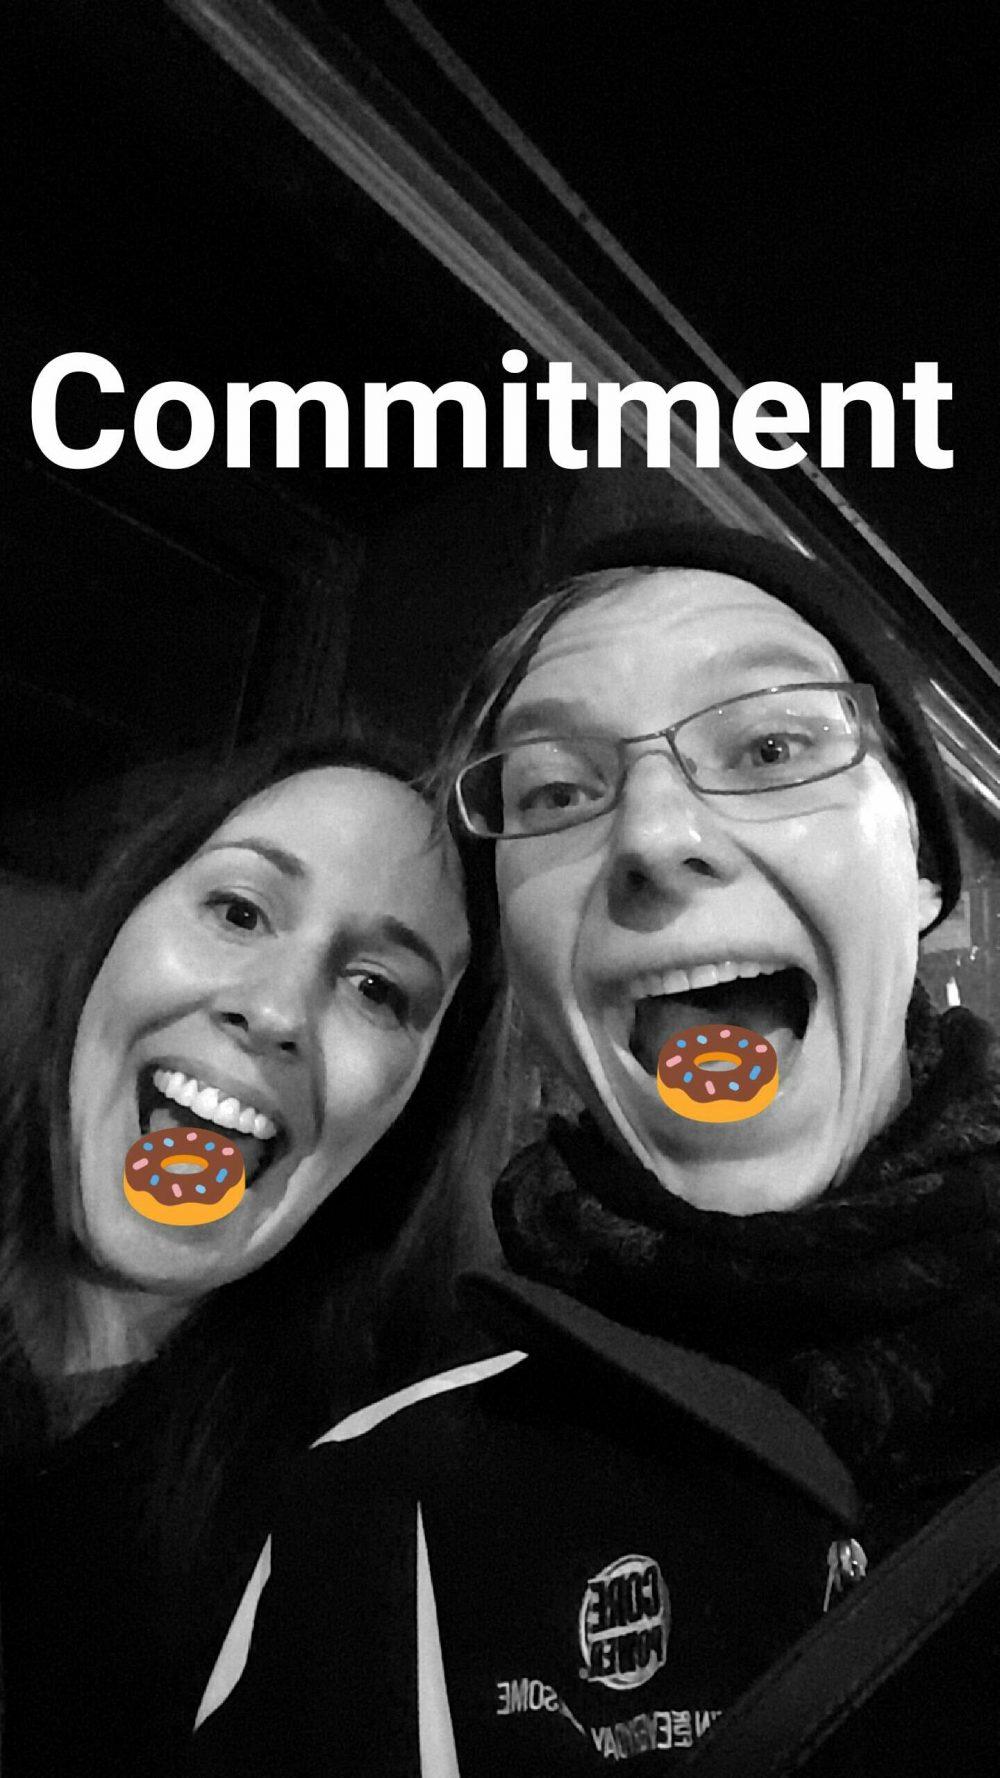 Donut commitment - Lauren Knight